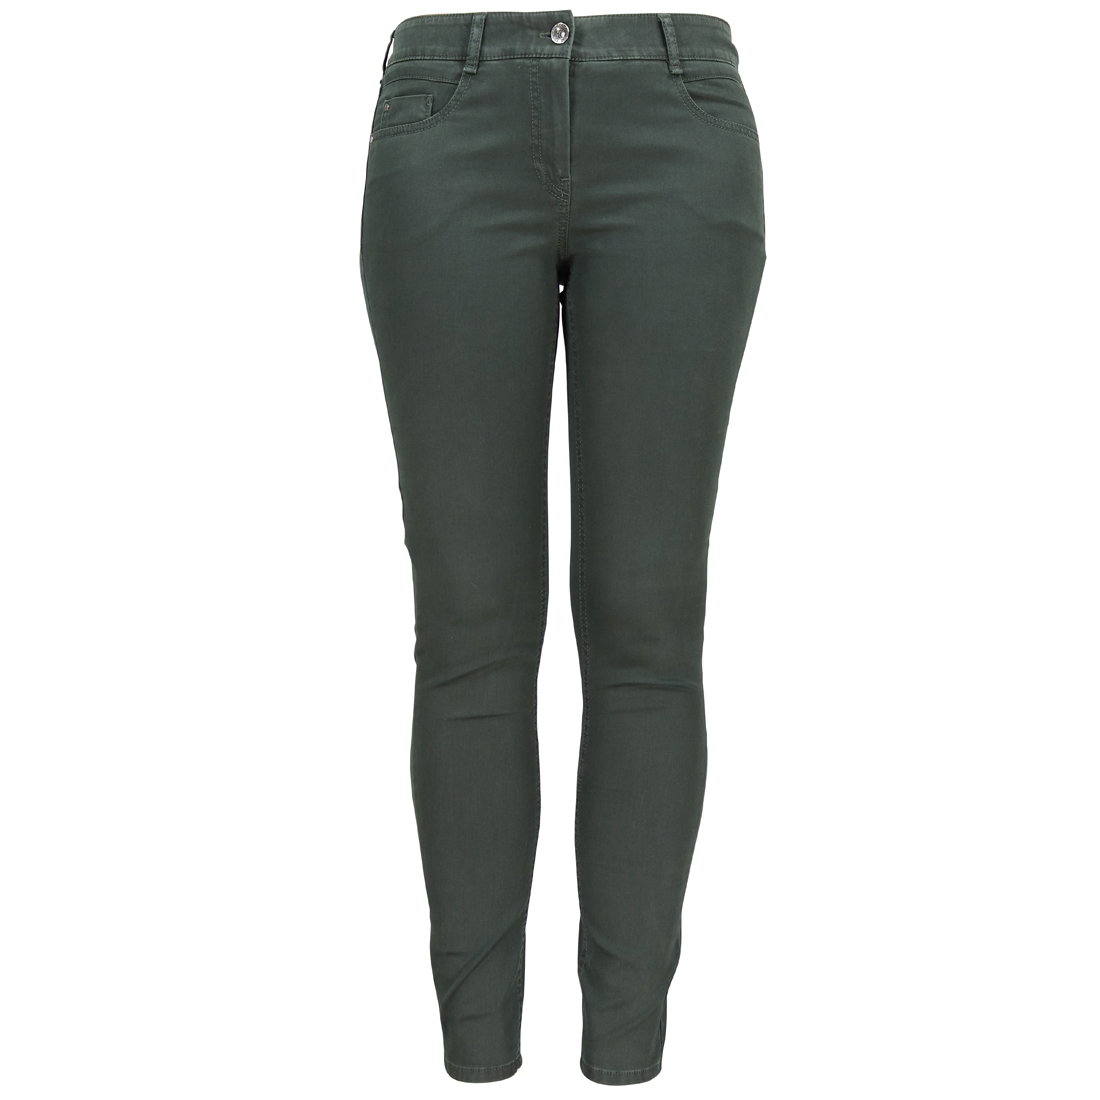 Image of Gardeur broek zuri90 61886 in het Donker Groen